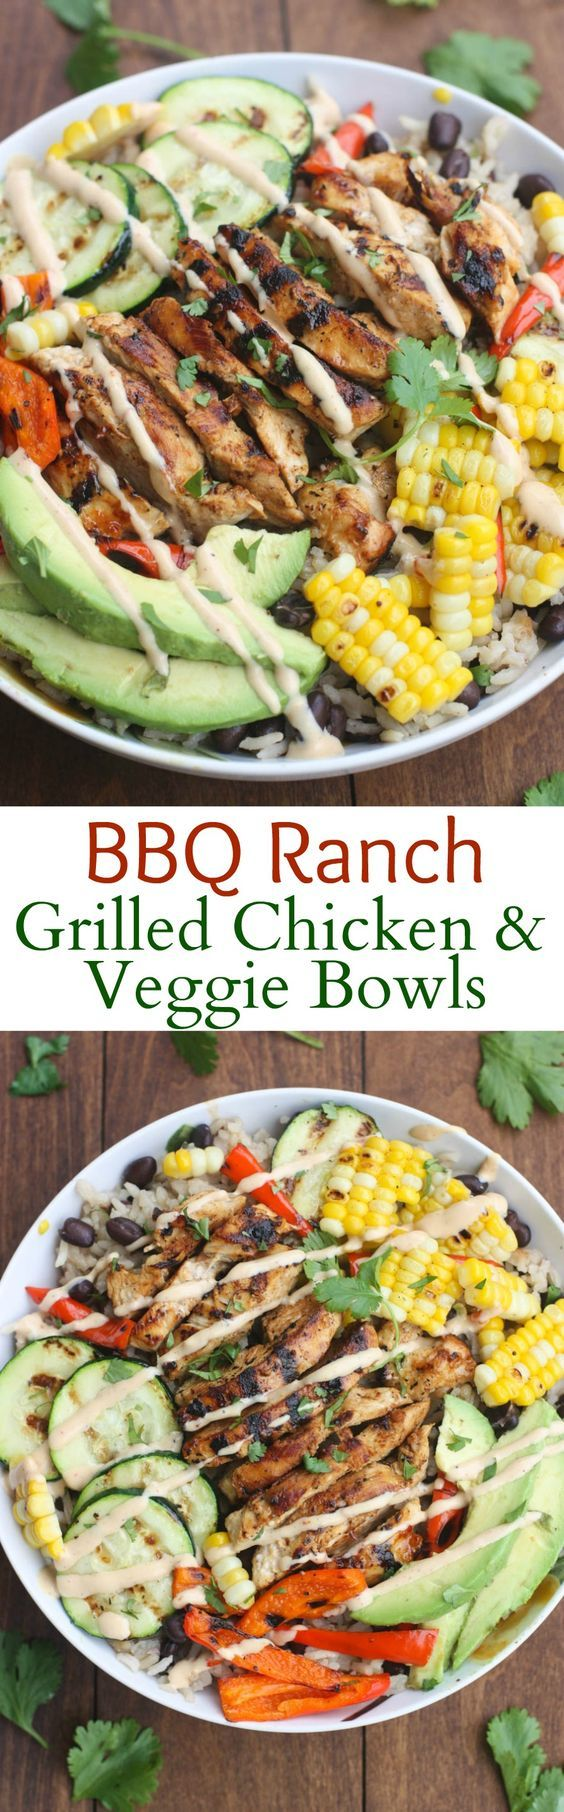 BBQ Ranch Grilled Chicken and Veggie Bowls   Recipe